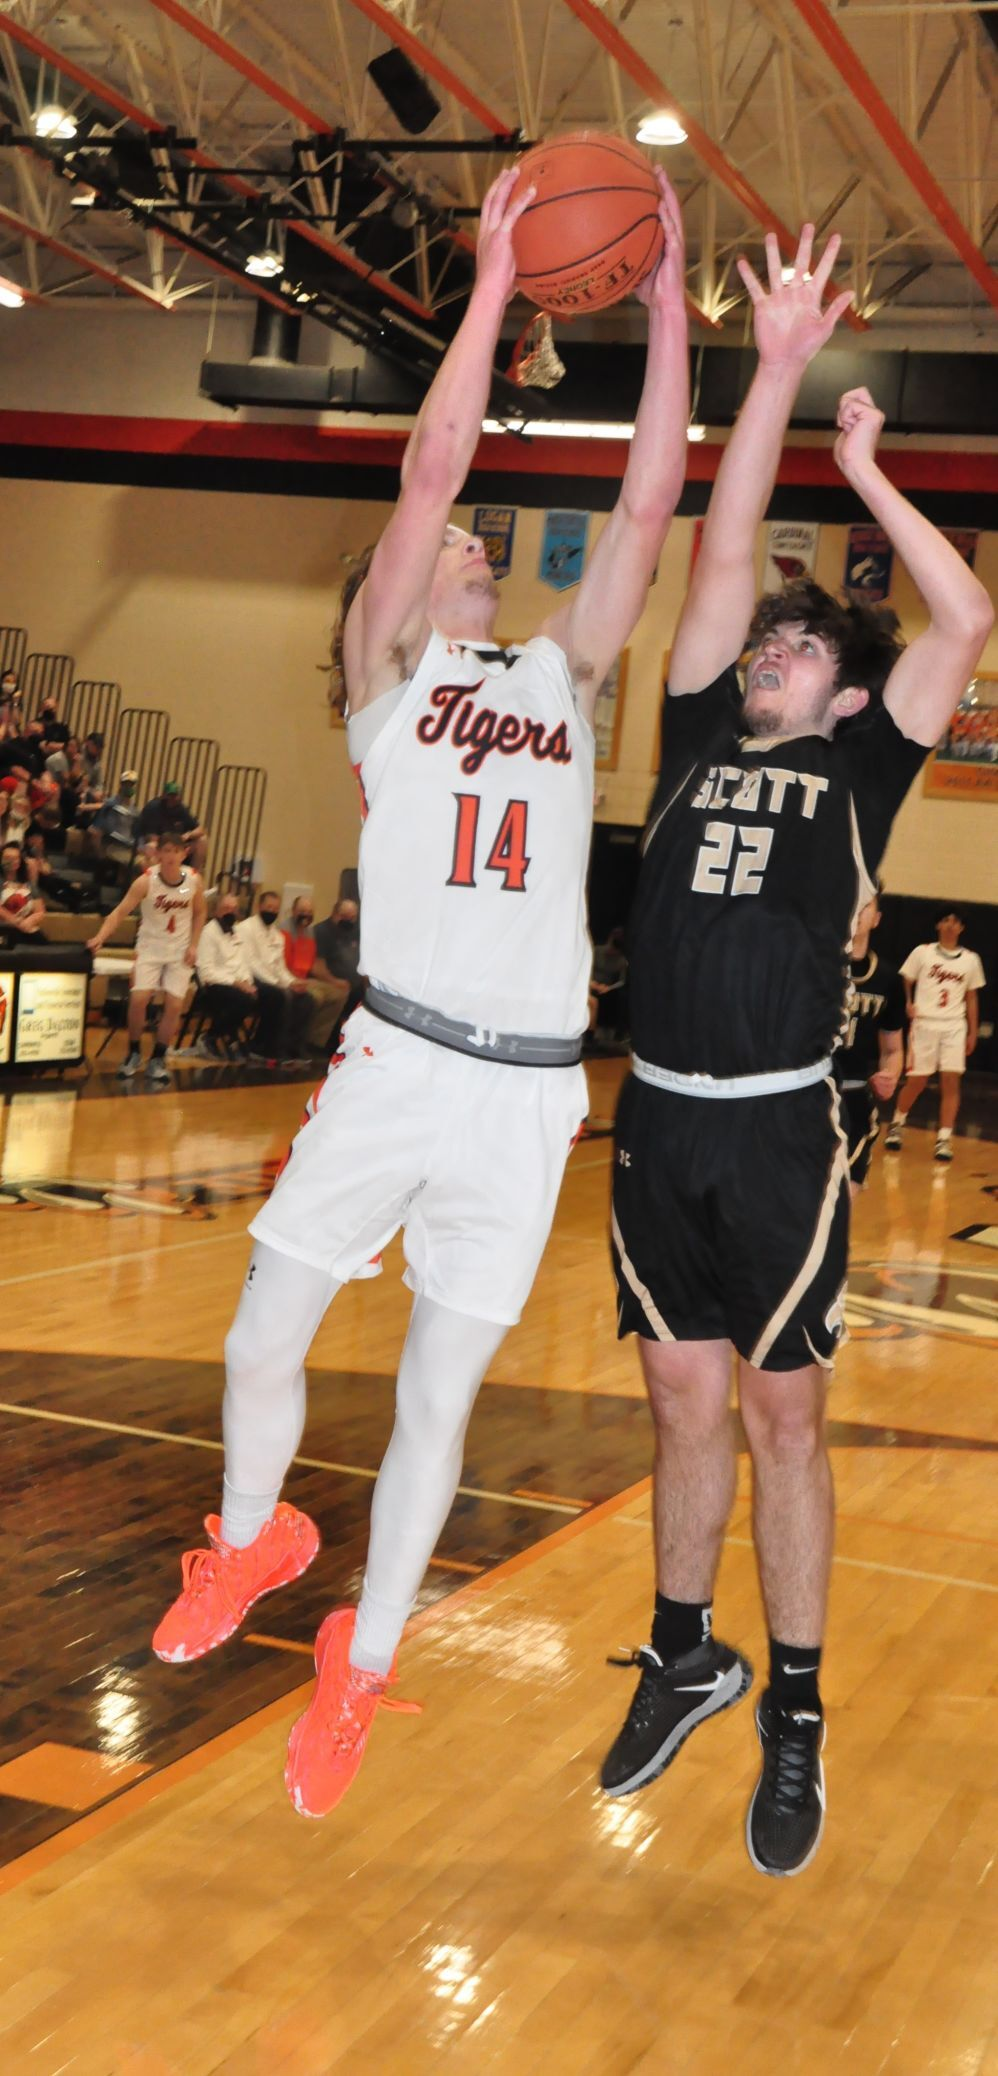 20210407-log-chap scott game Brody Dalton rebound